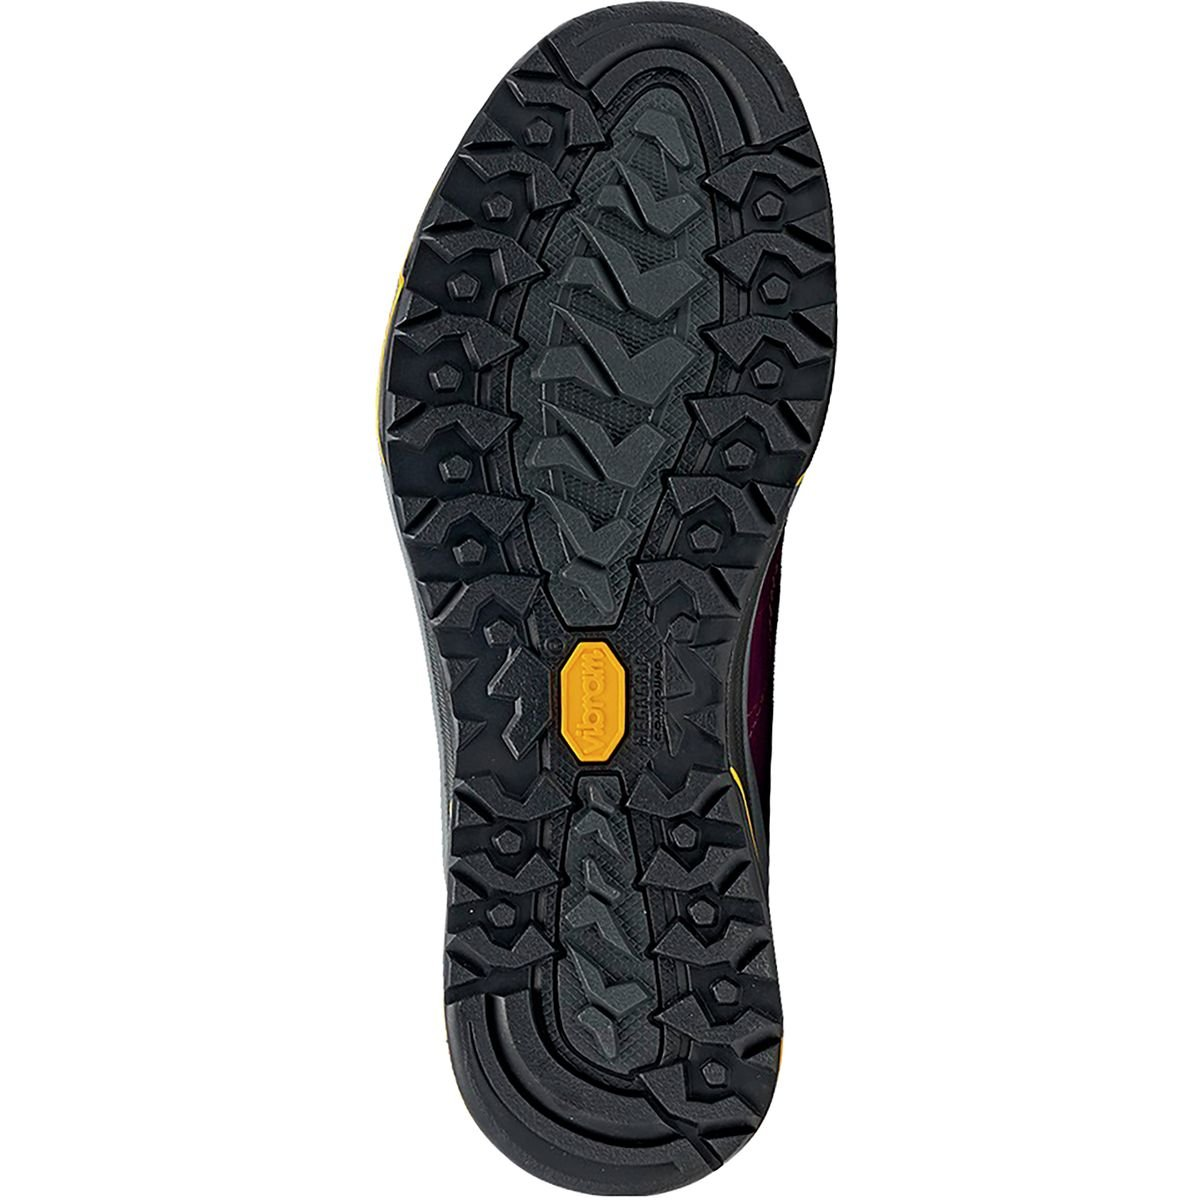 Asolo Women's Nucleon GV Hiking Shoes B00WE3V2NA 6.5 B(M) US|Verbena/Yellow